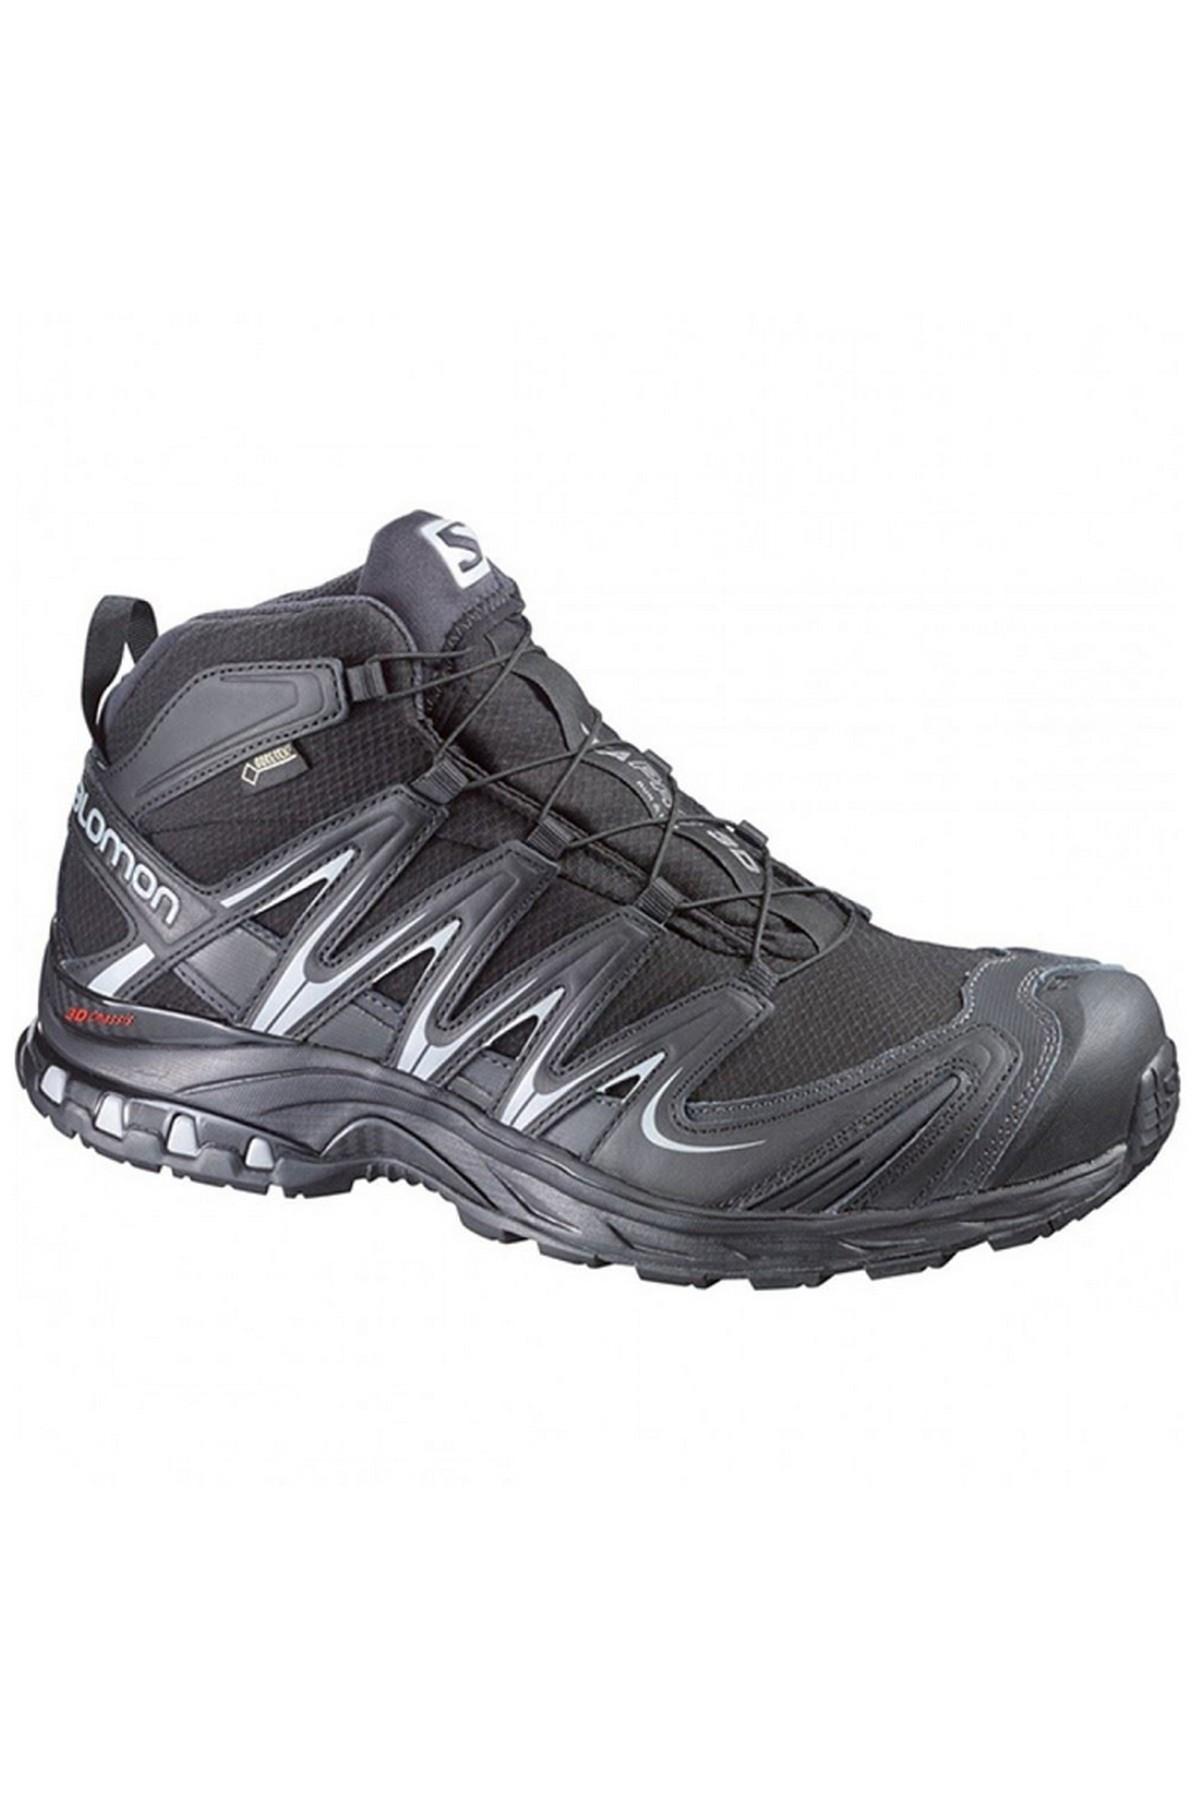 Salomon XA Pro Mid GTX Erkek Ayakkabı (L40765600)